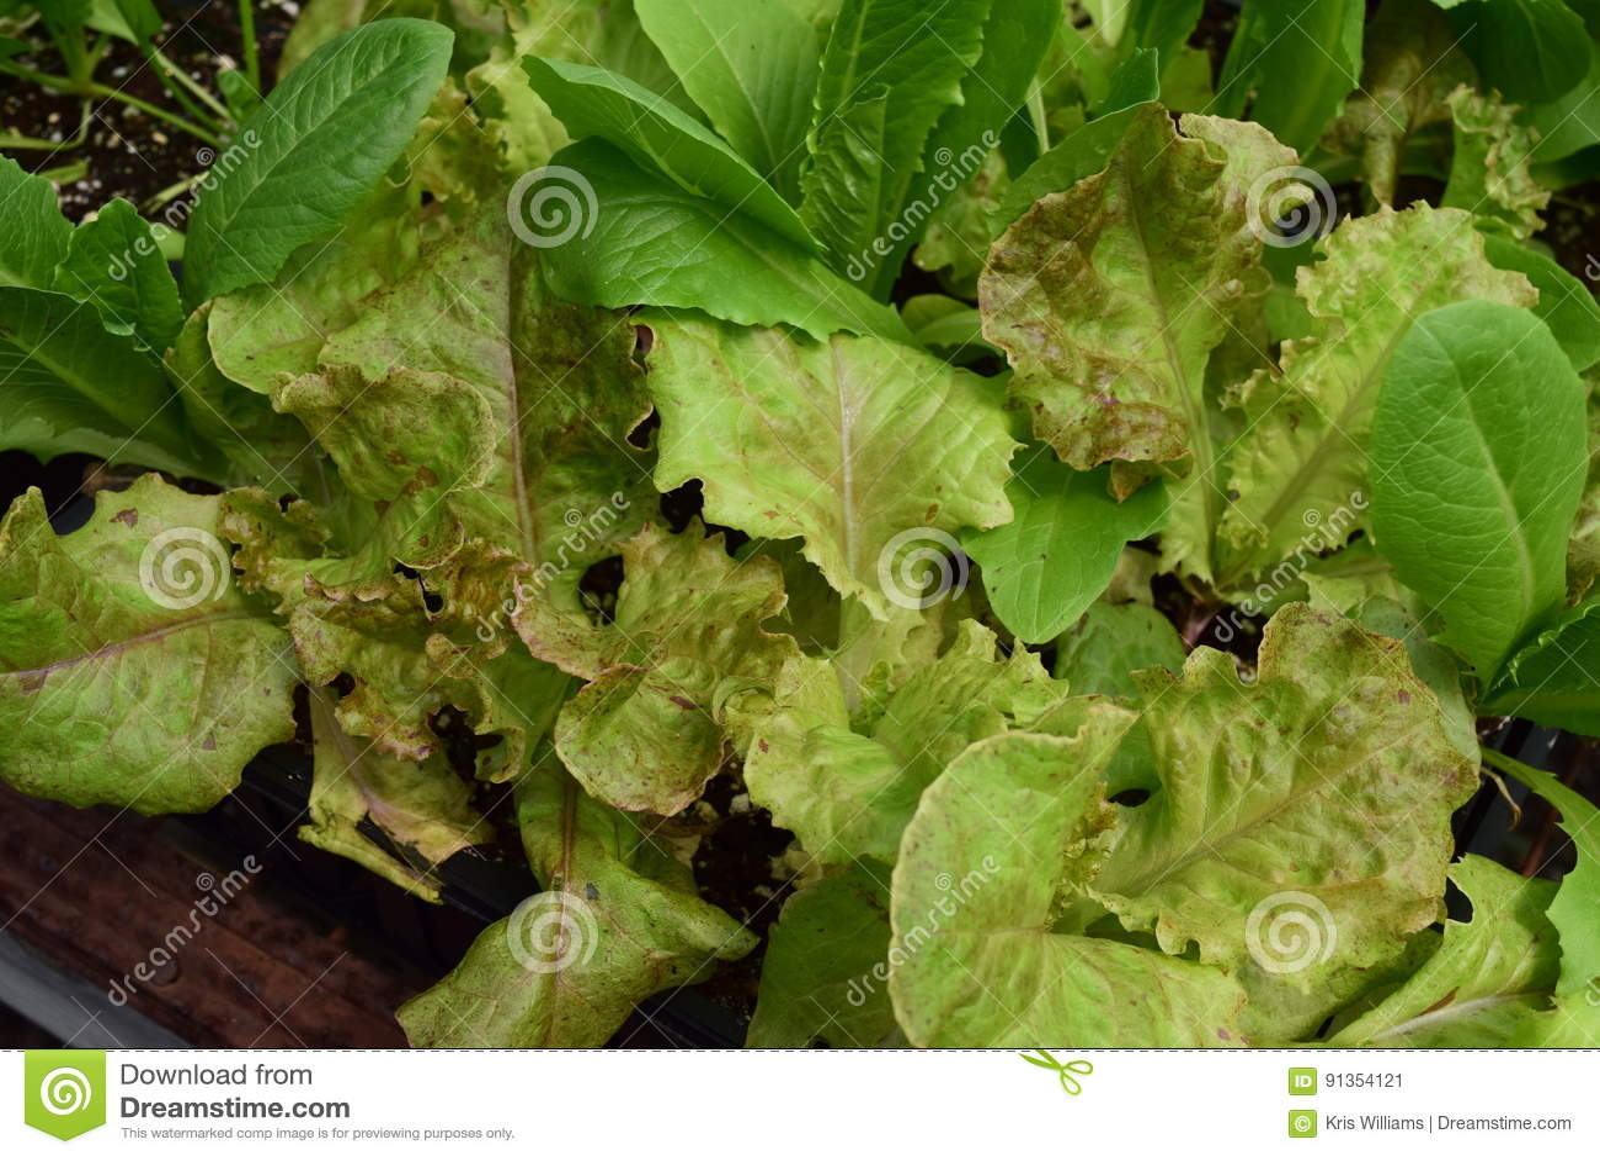 Edible lettuce growing in a seed flat